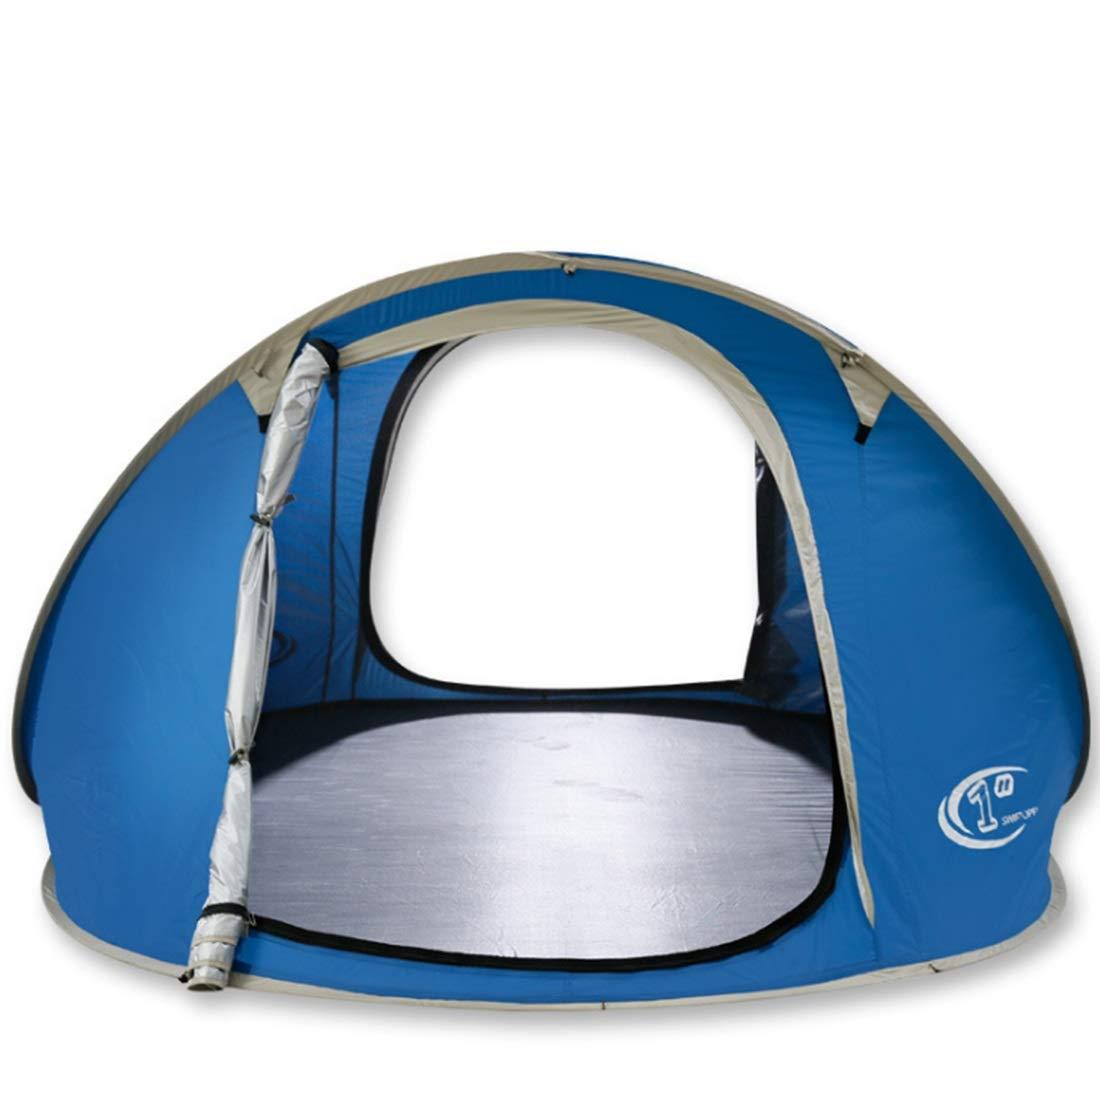 Jhcpca : ワイルドキャンプのための3人または4人の自動テント B07KT73WFH (Color : Jhcpca Sapphire) Sapphire B07KT73WFH, パリスマダム:c8c5b76e --- ijpba.info